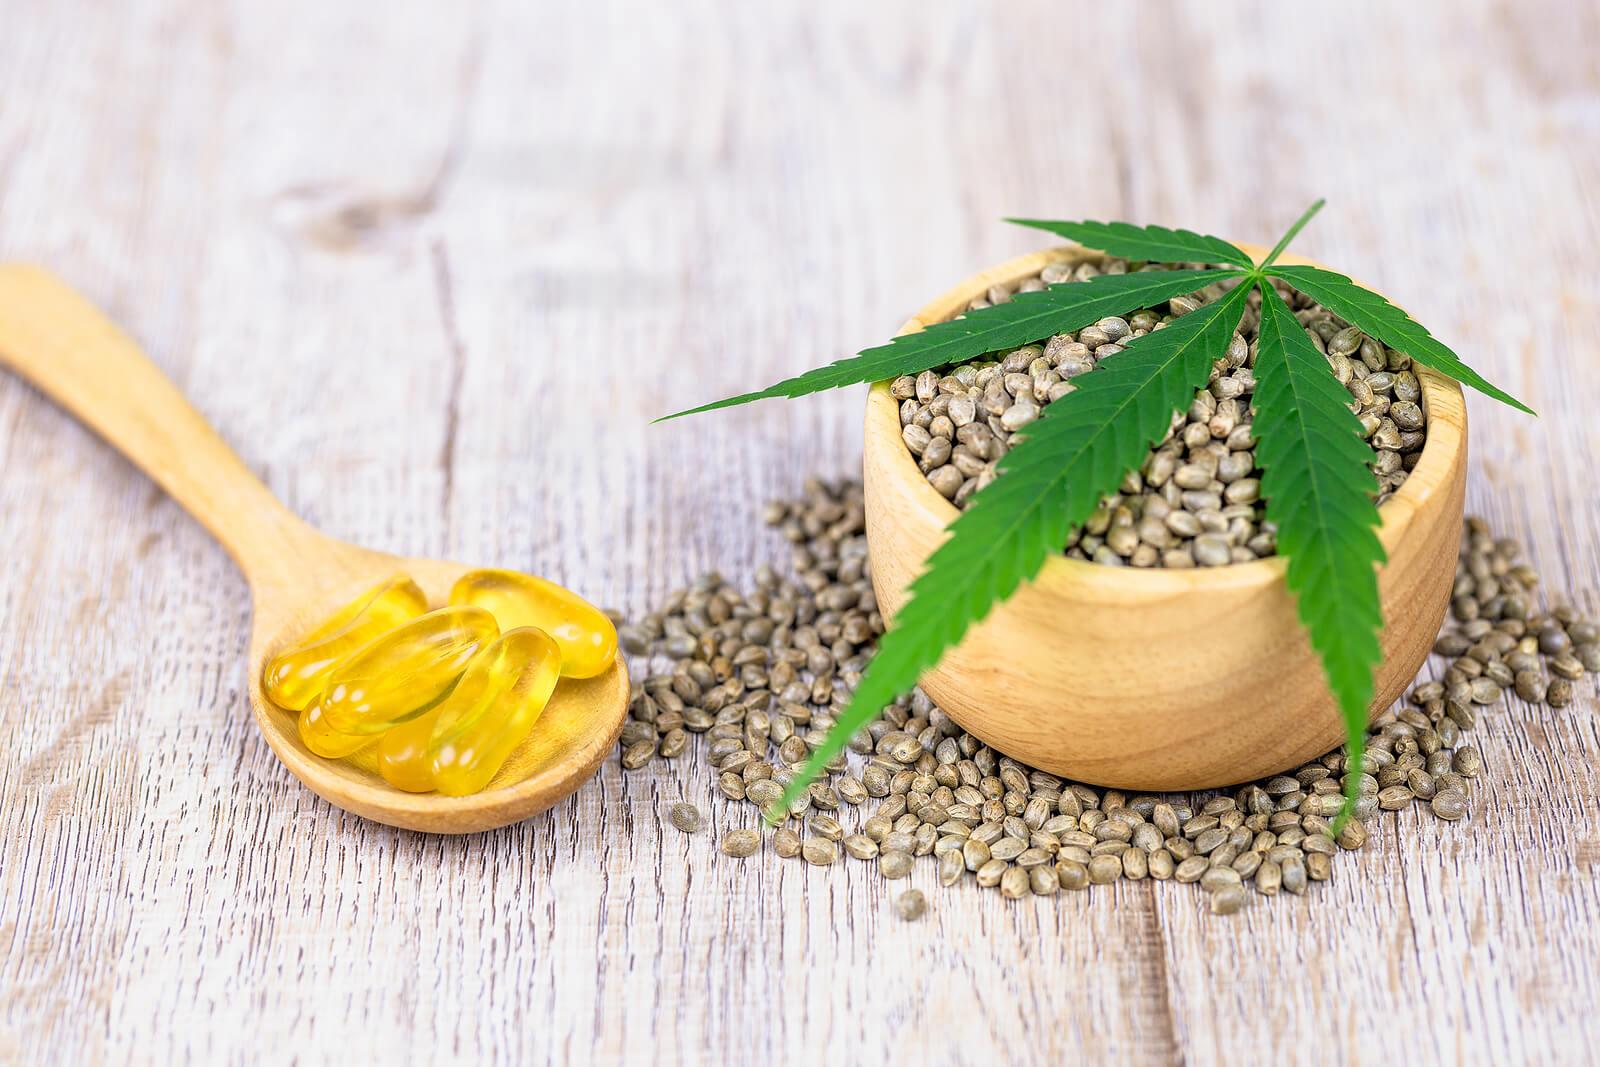 Buy Marijuana Seeds In Lake Havasu City